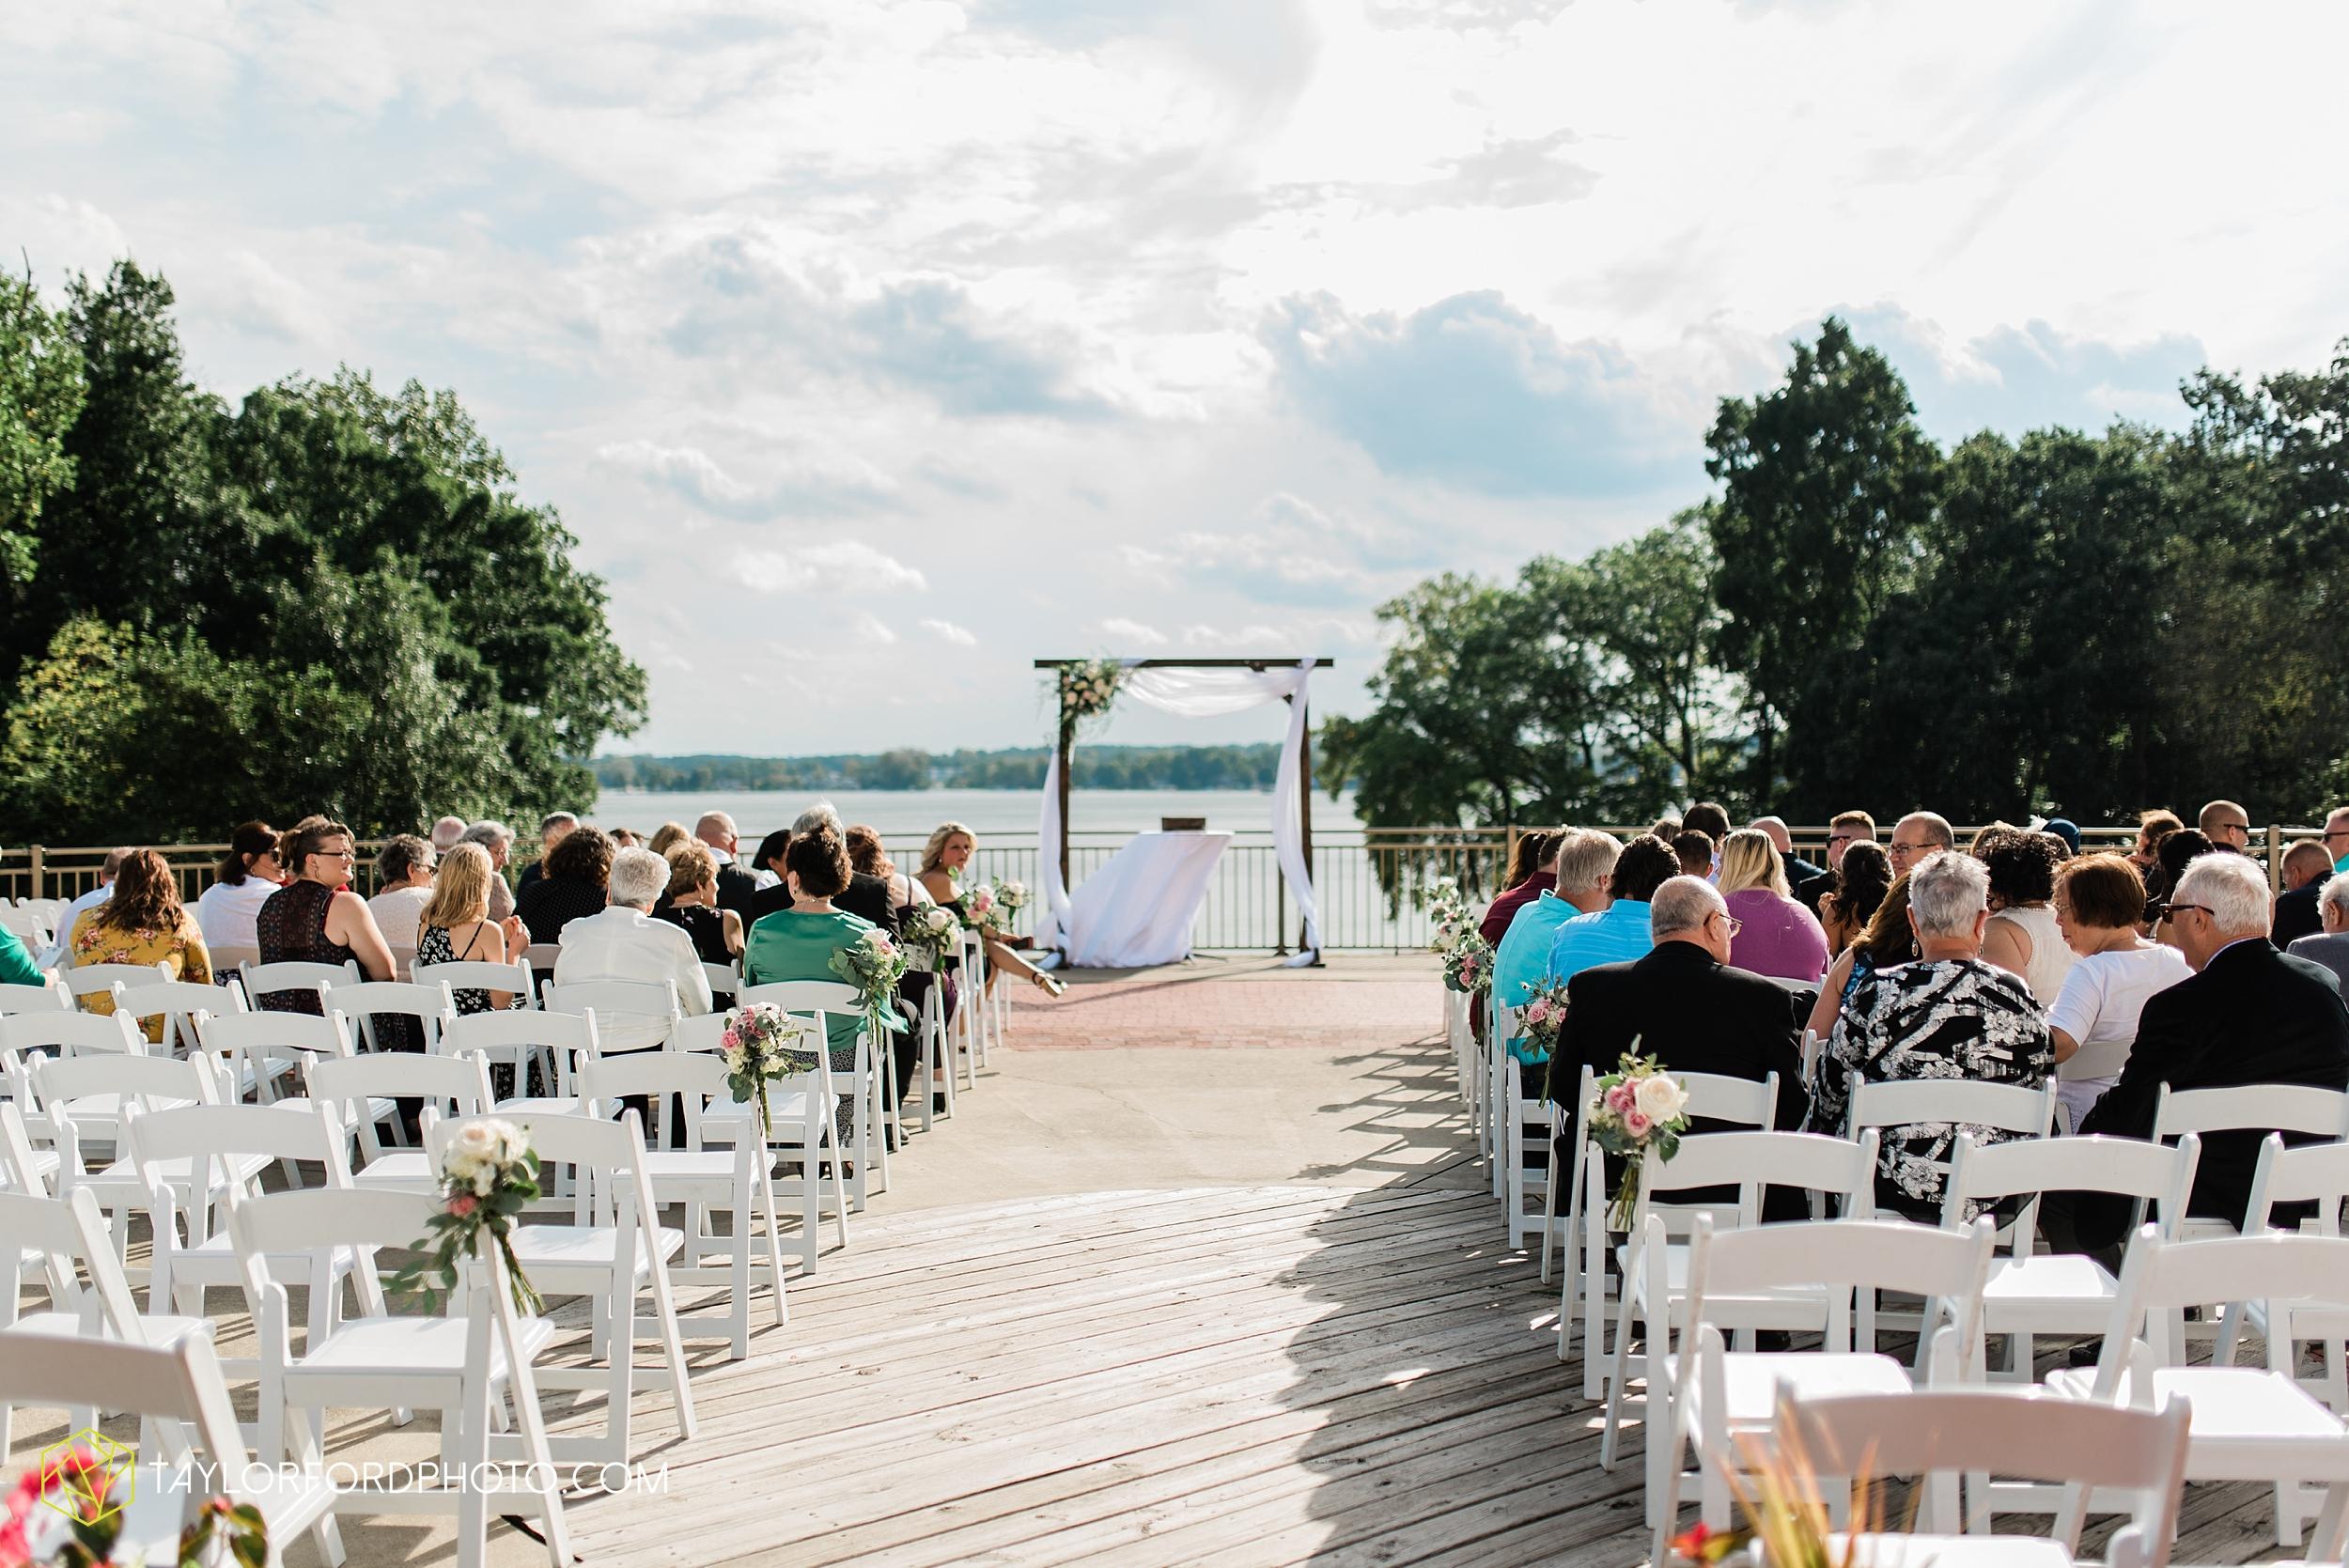 brook-loren-pokagon-state-park-angola-indiana-potowatomi-inn-wedding-fall-lake-james-photographer-taylor-ford-photography_0504.jpg